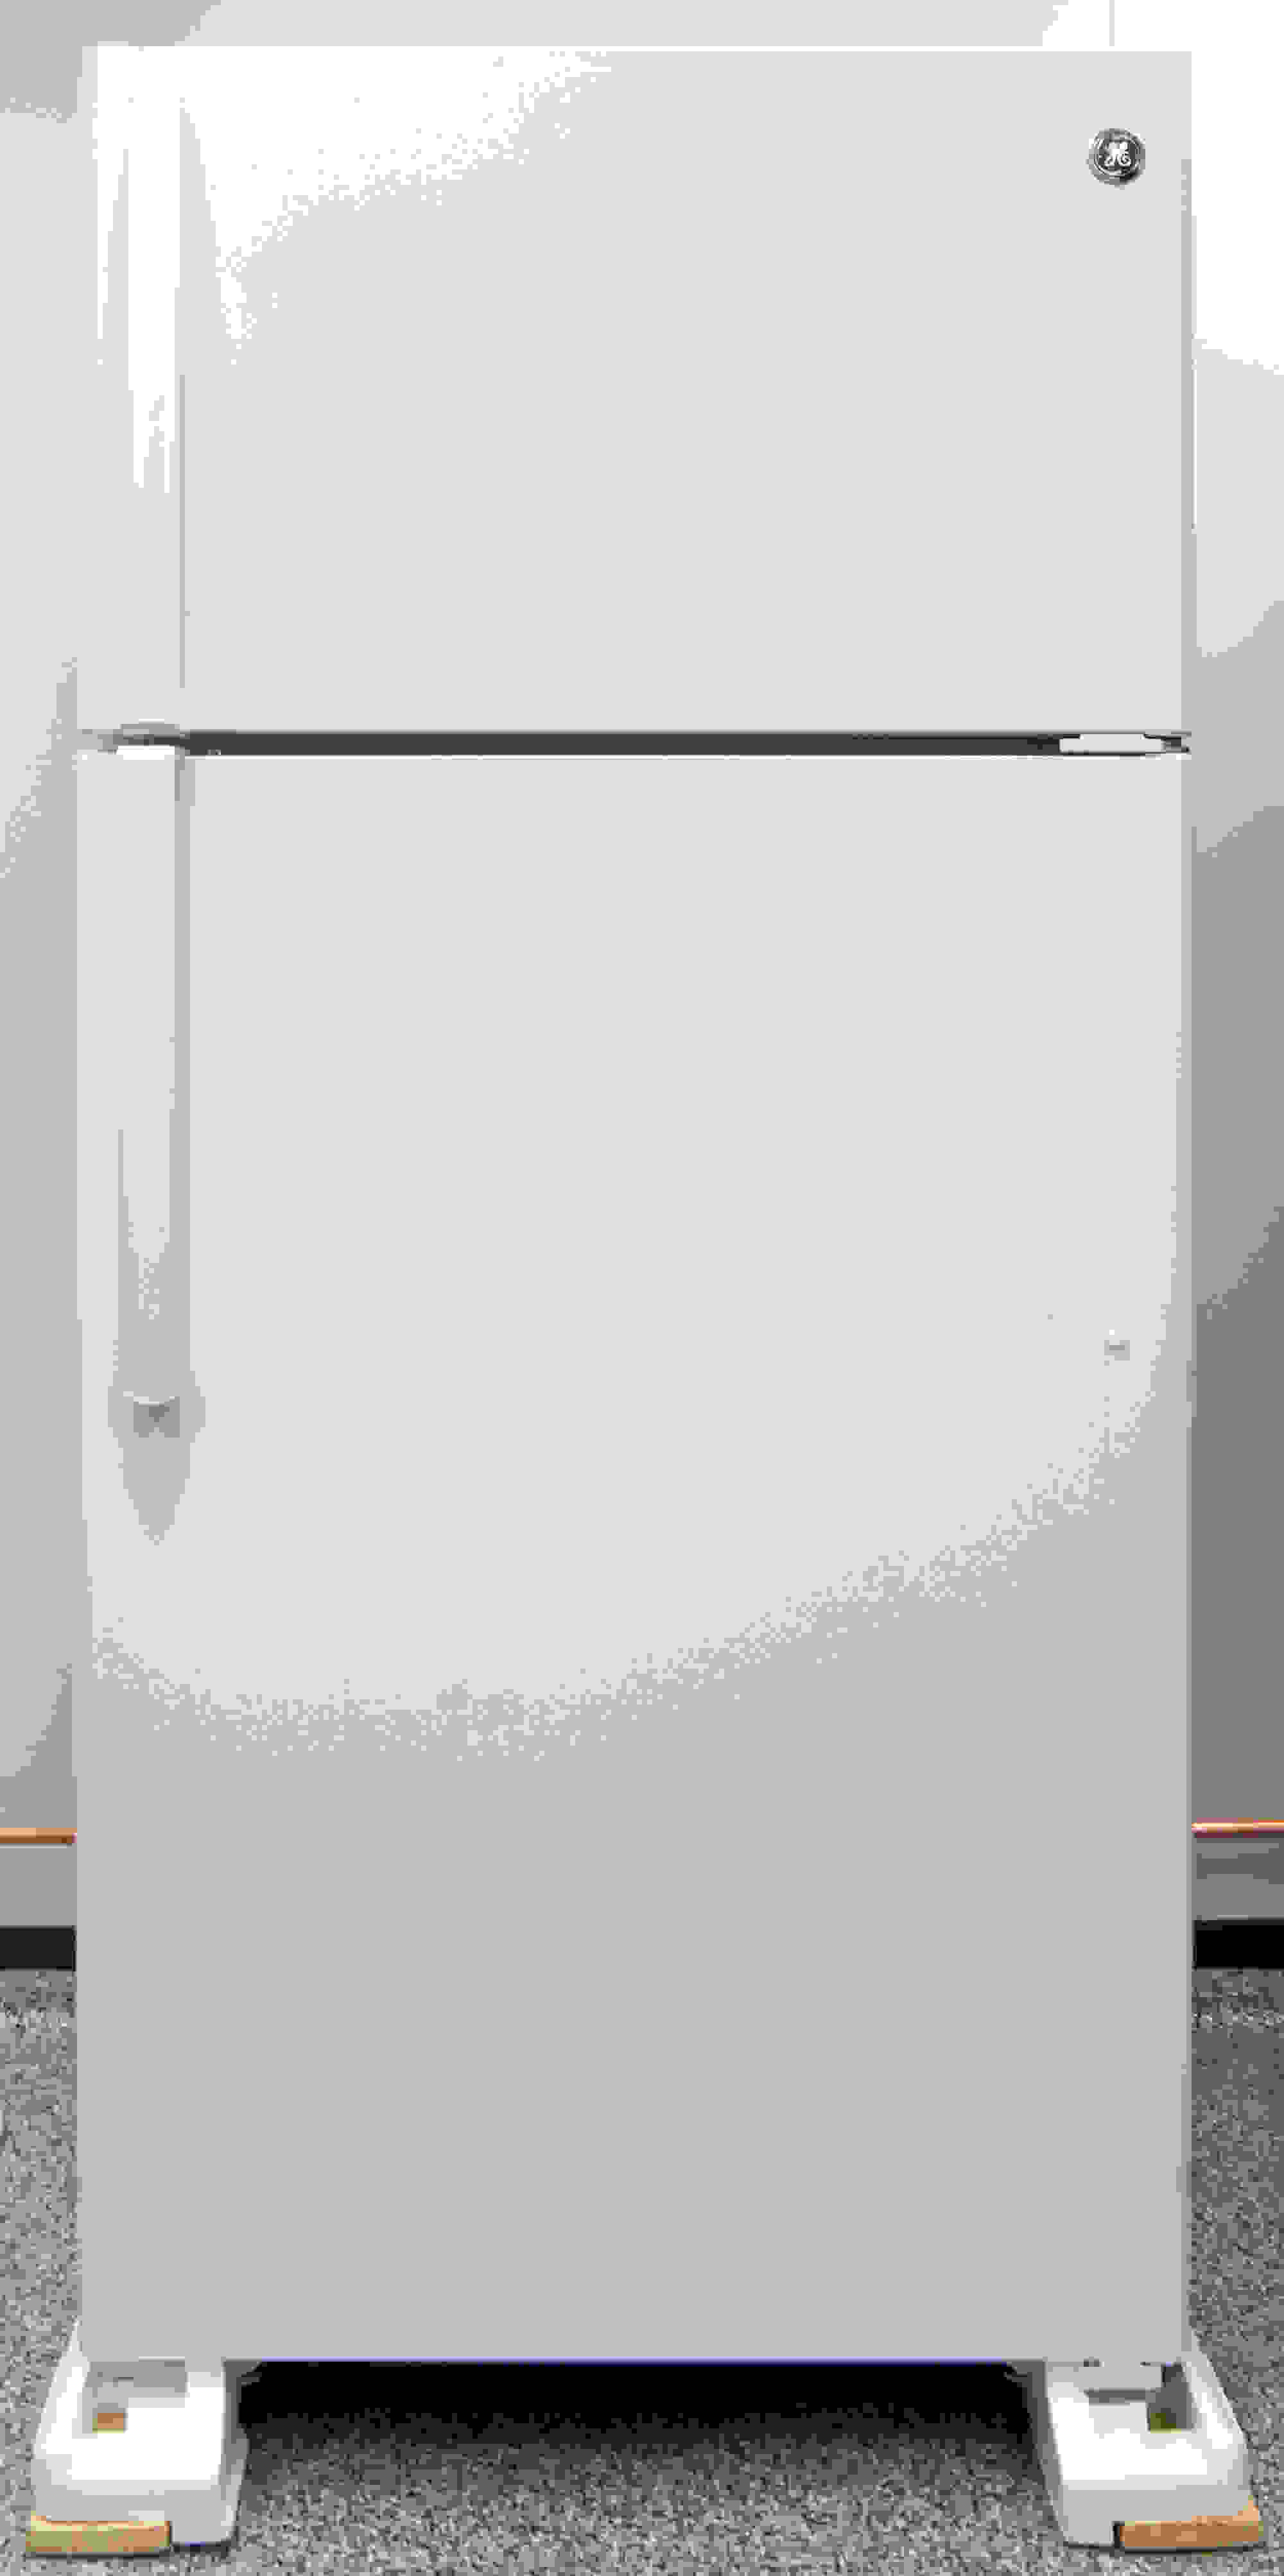 The GE GTS16DTHWW' is an unassuming white top freezer. Pretty straightforward.